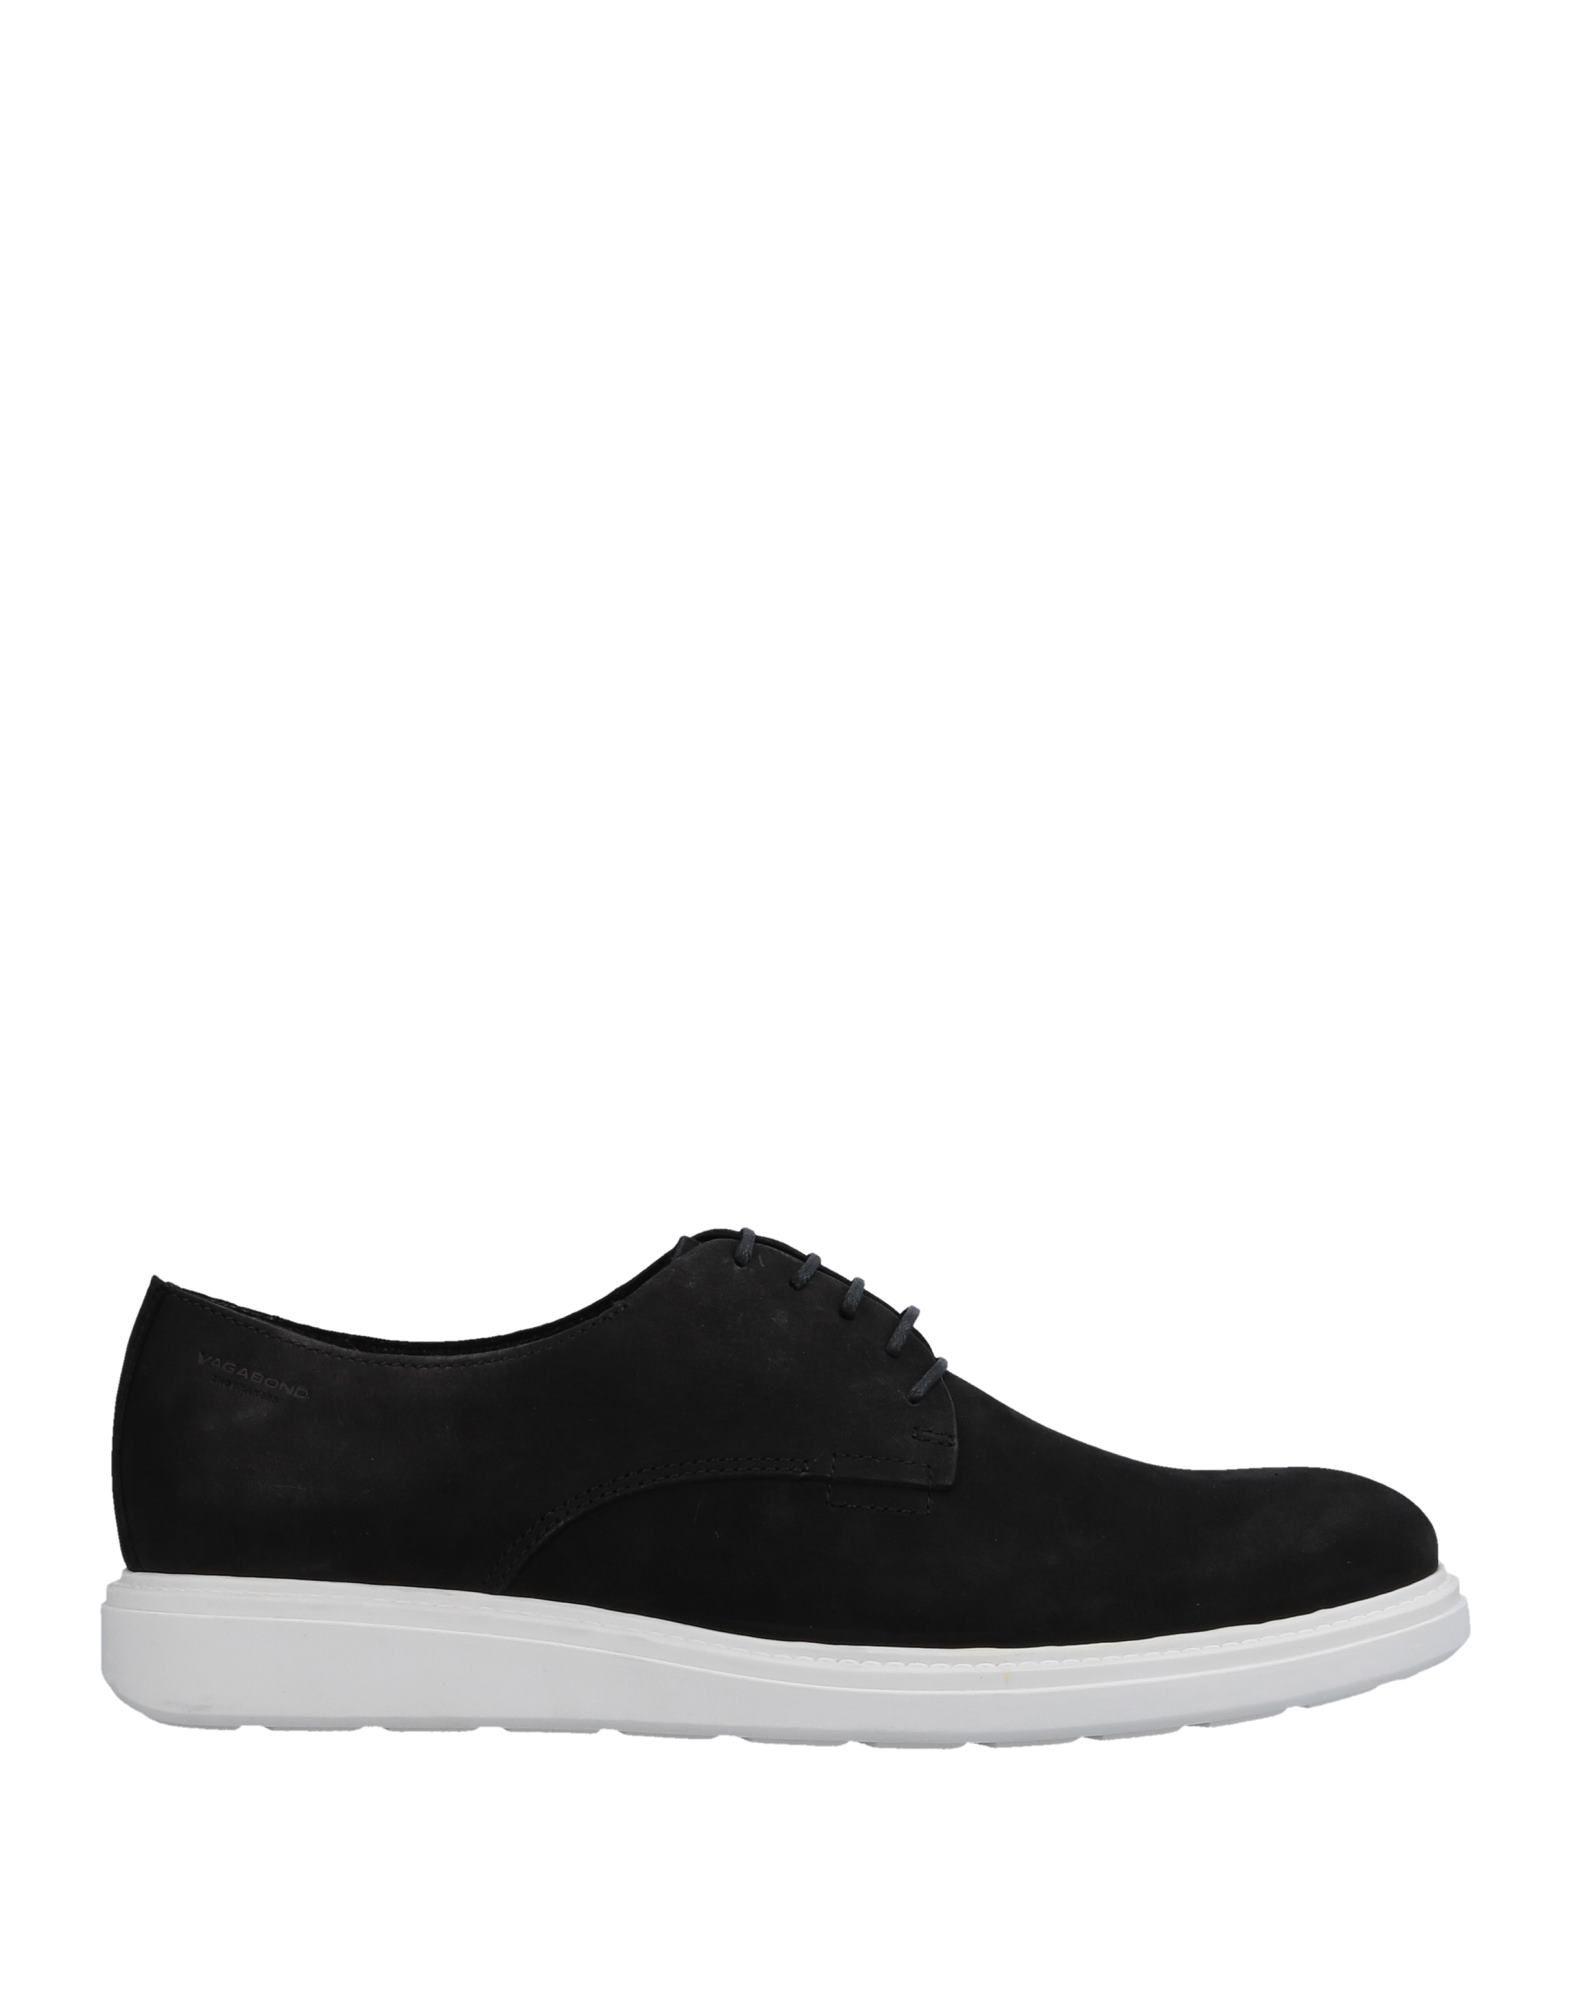 Rabatt echte Schuhe Vagabond Shoemakers Schnürschuhe Herren  11507185KH